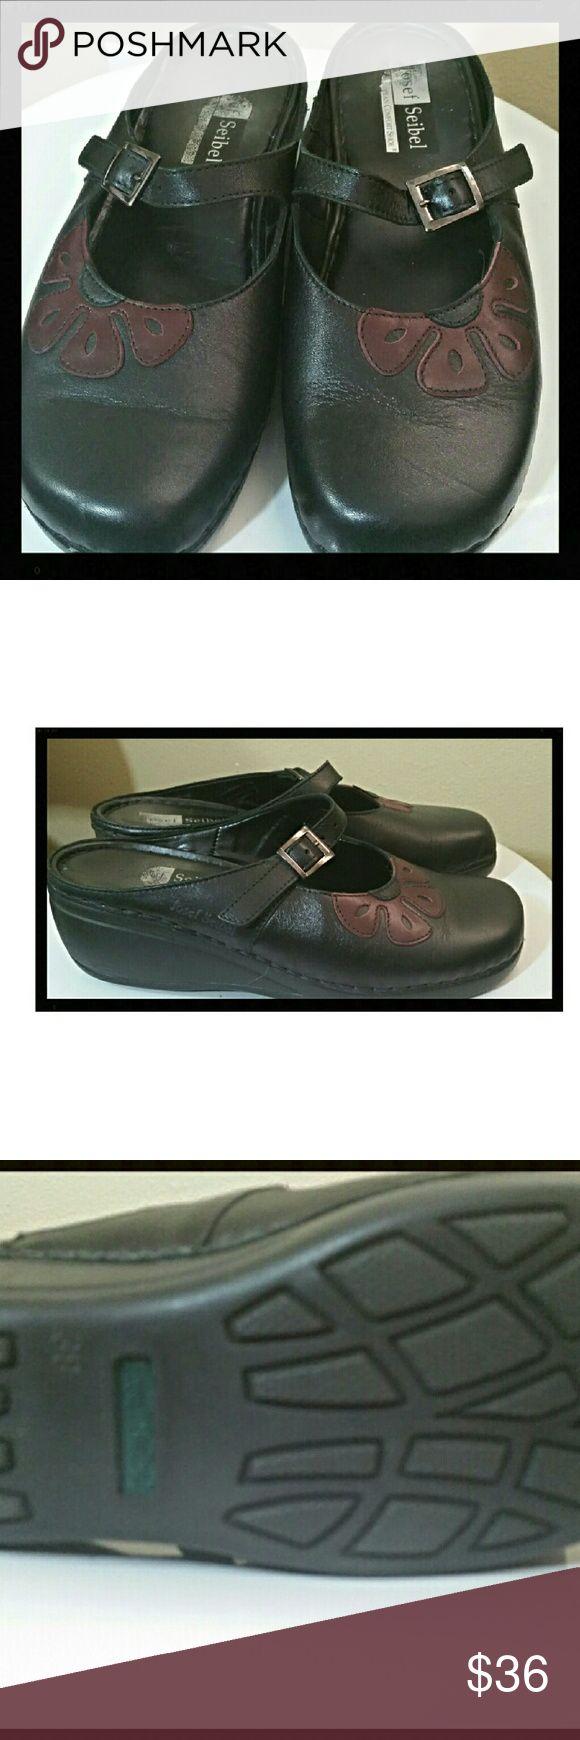 Josef Seibel Mary Jane shoes.....size8 European Comfort shoe. Lots of wear left. Nice shape. Josef Seibel Shoes Mules & Clogs